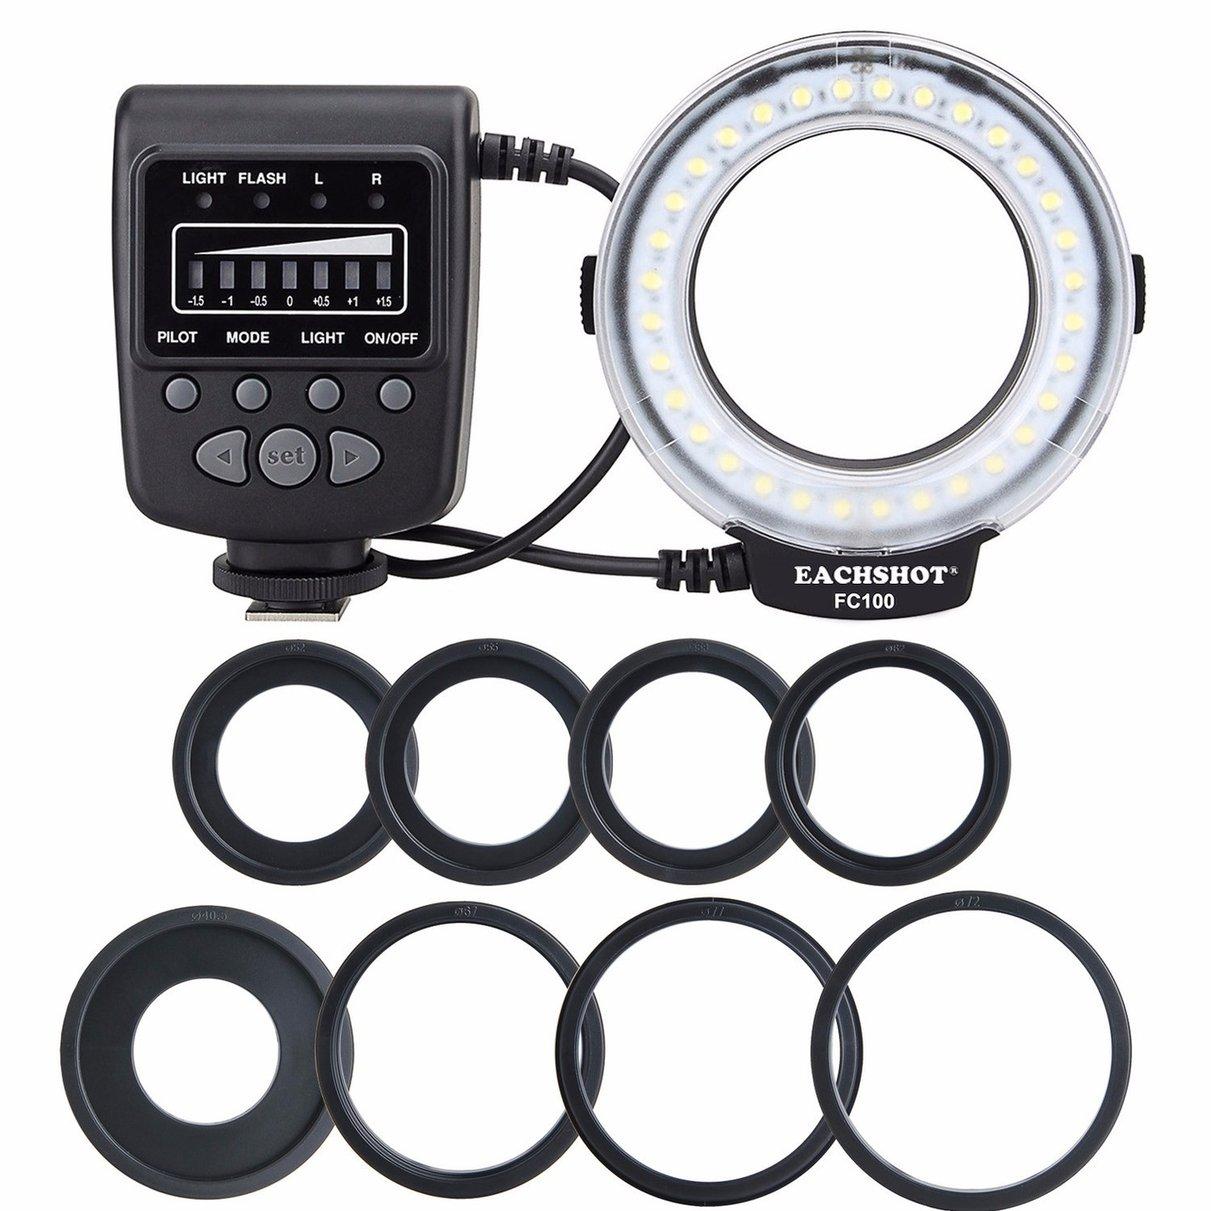 FC100 Meike FC-100 Macro Anillo Flash/Luz MK FC 100 para Canon para EOS 650D 600D 60D 7D 550D 1100D T3i T5i T4i T3